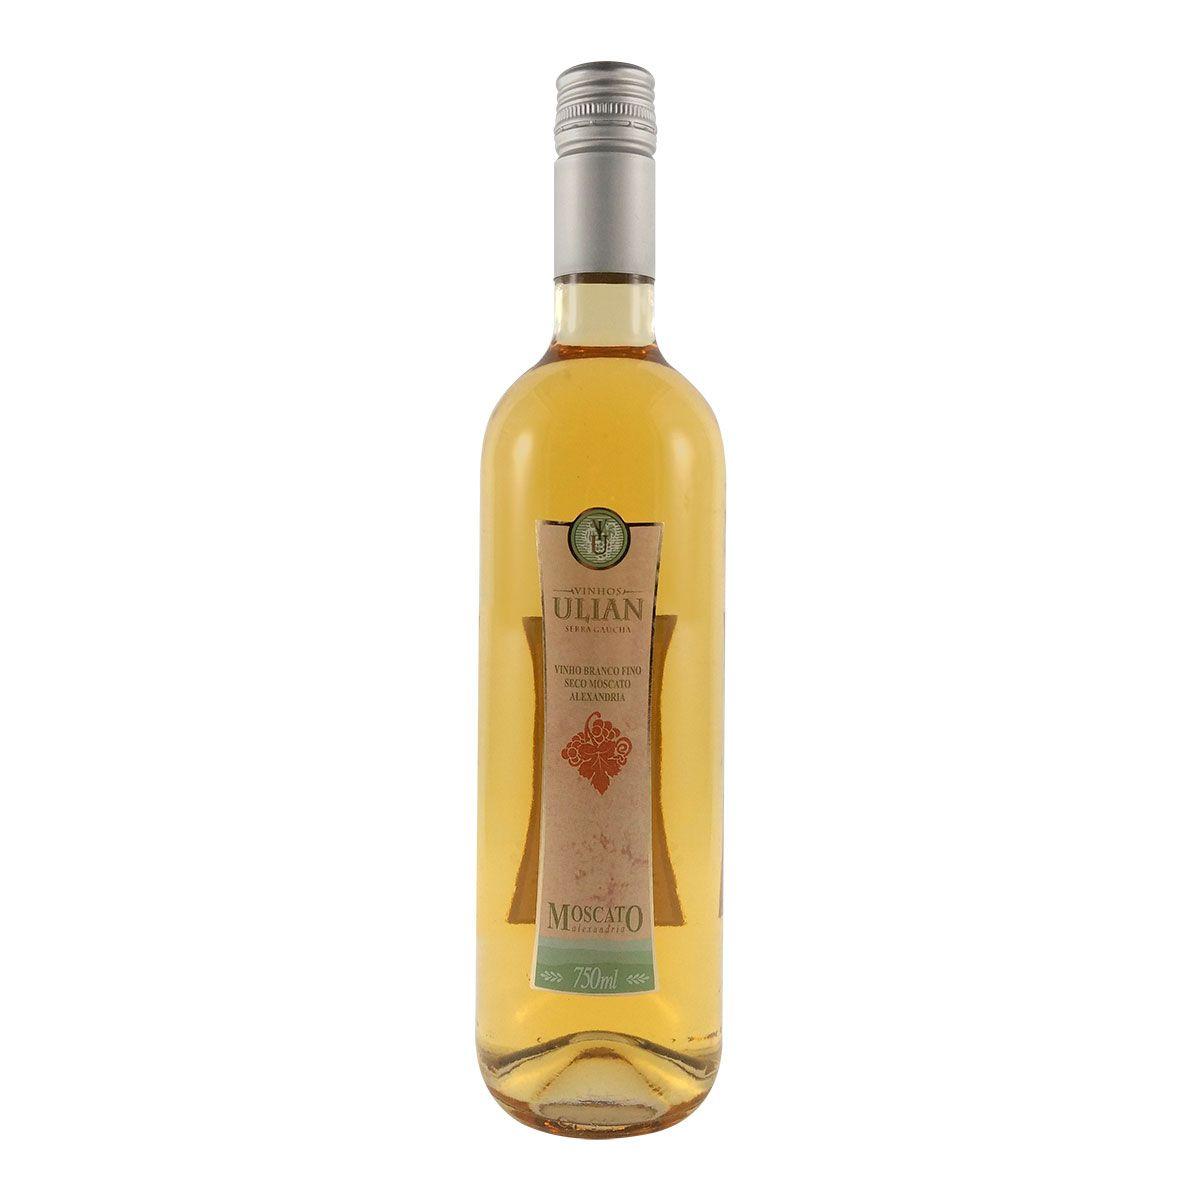 Vinho Branco Ulian Moscato Alexandria 750ml